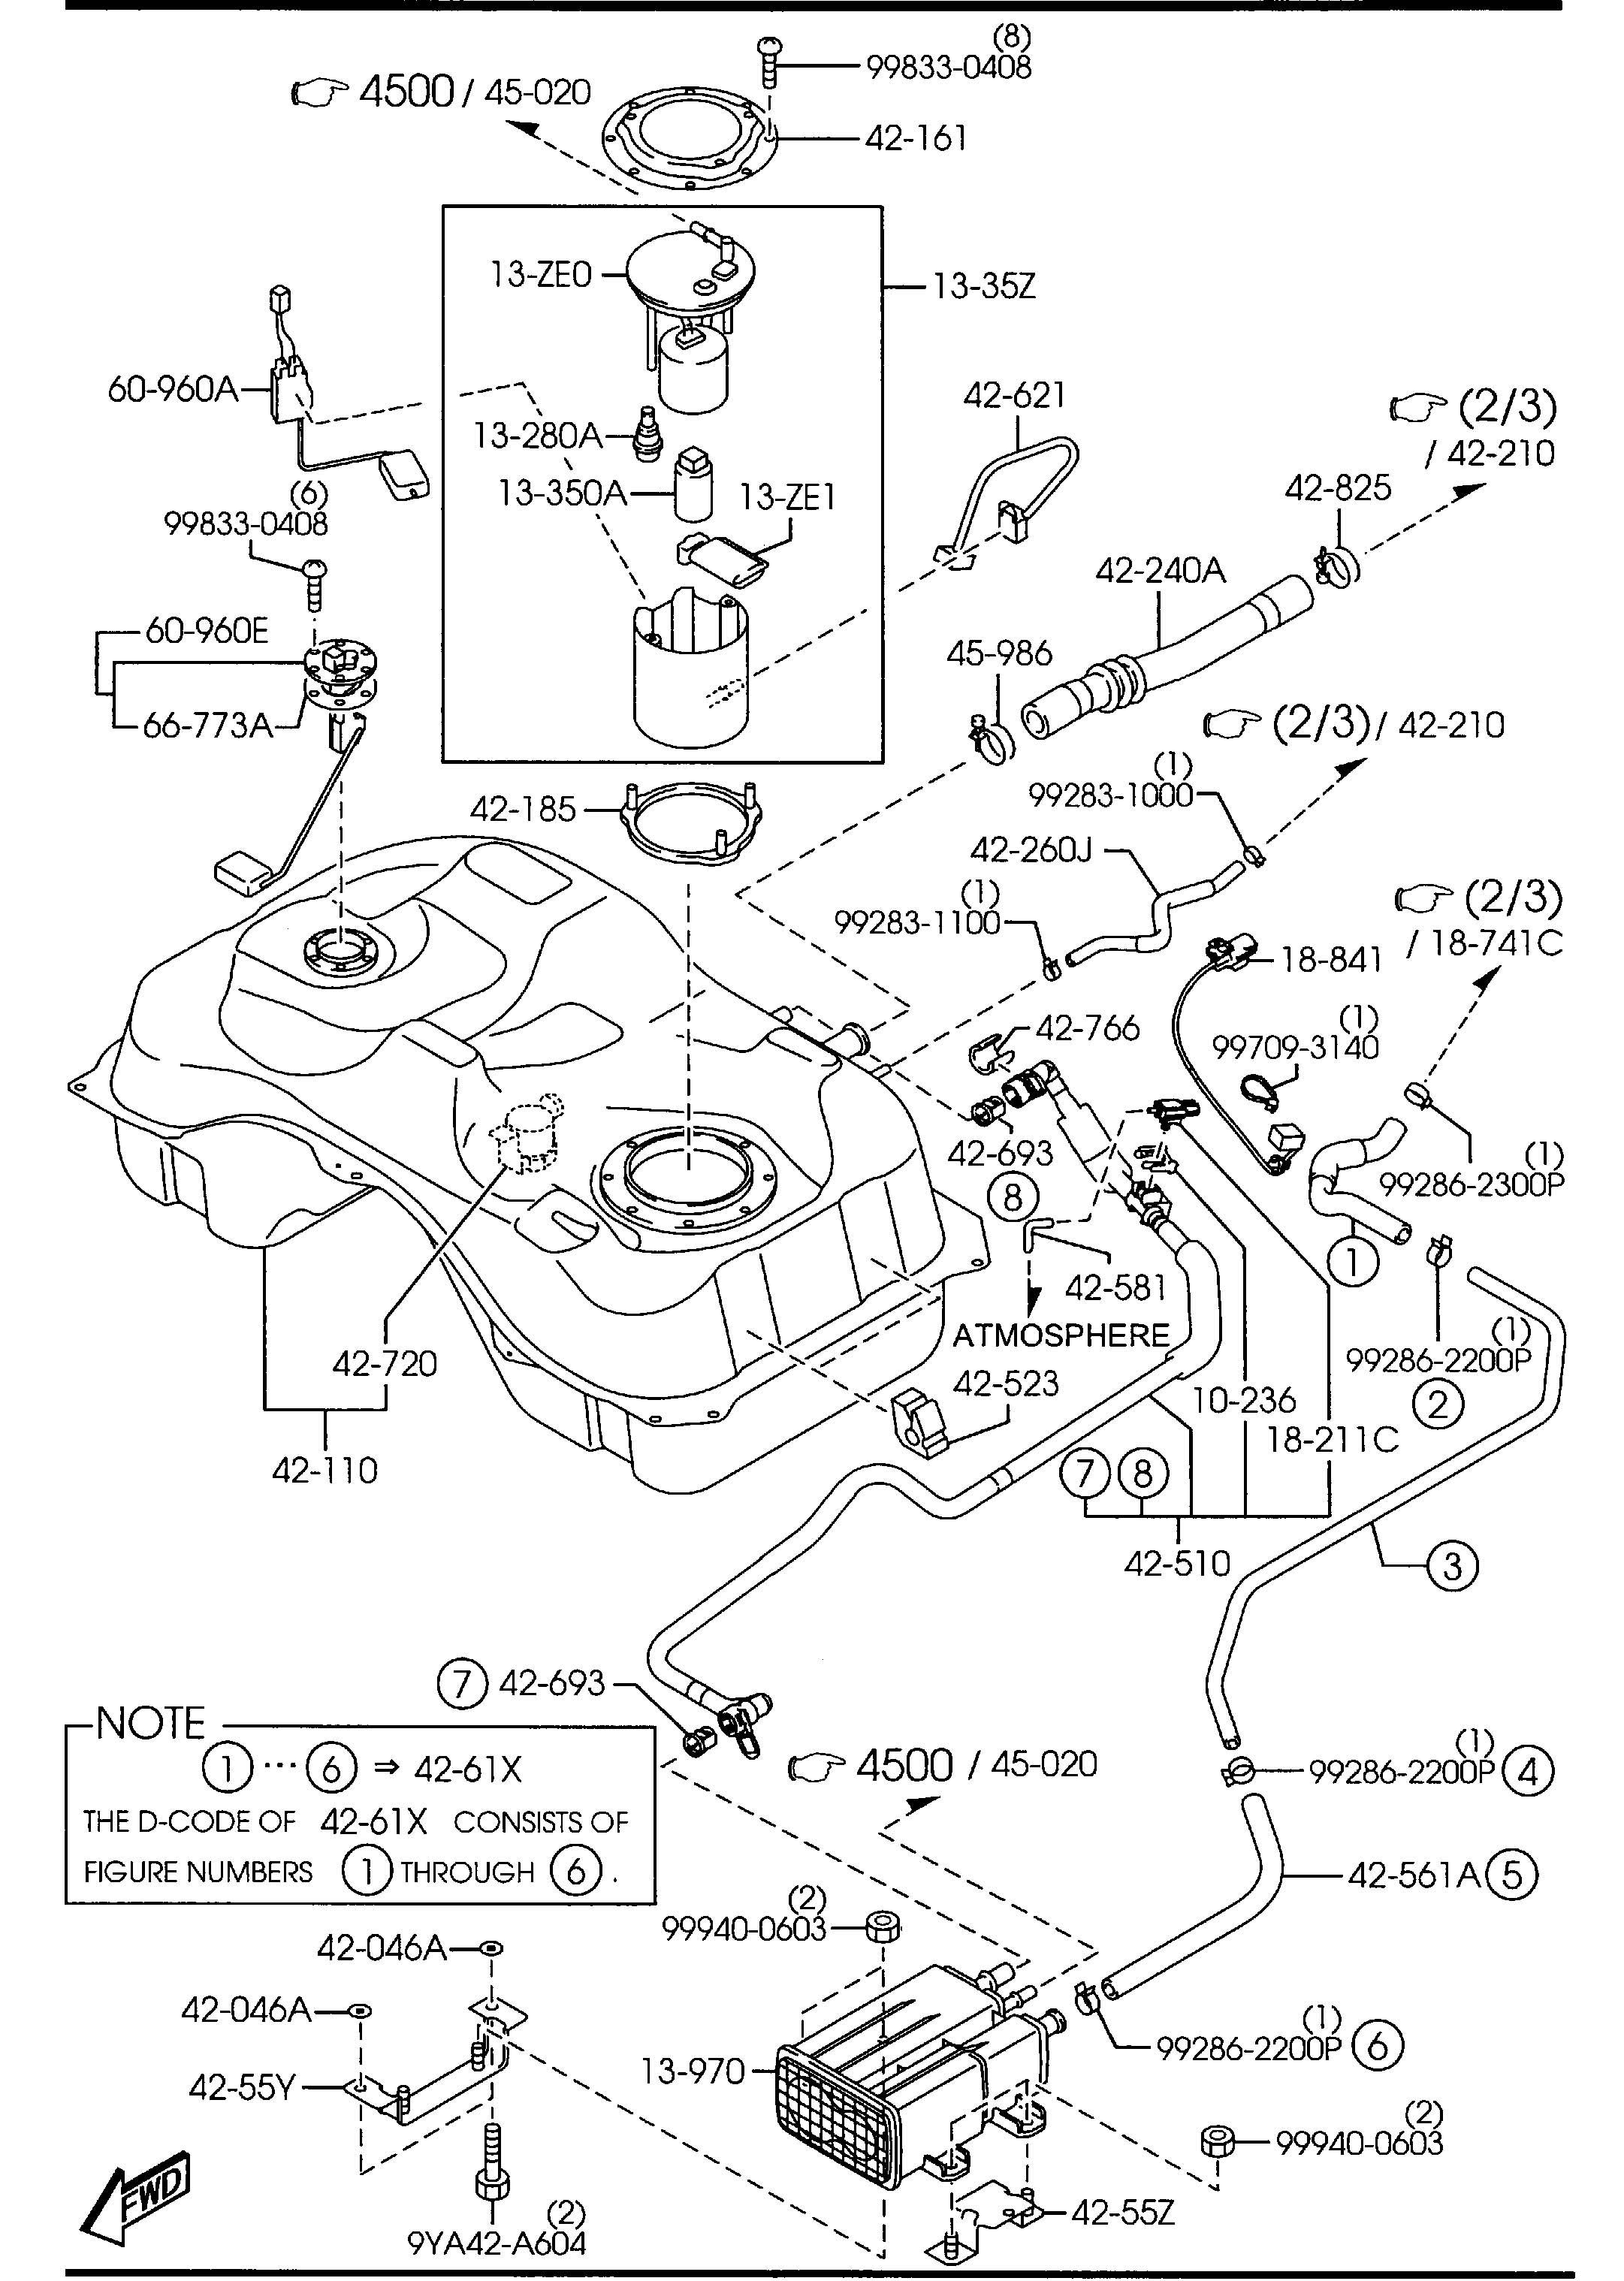 Mazda Fuel Tank